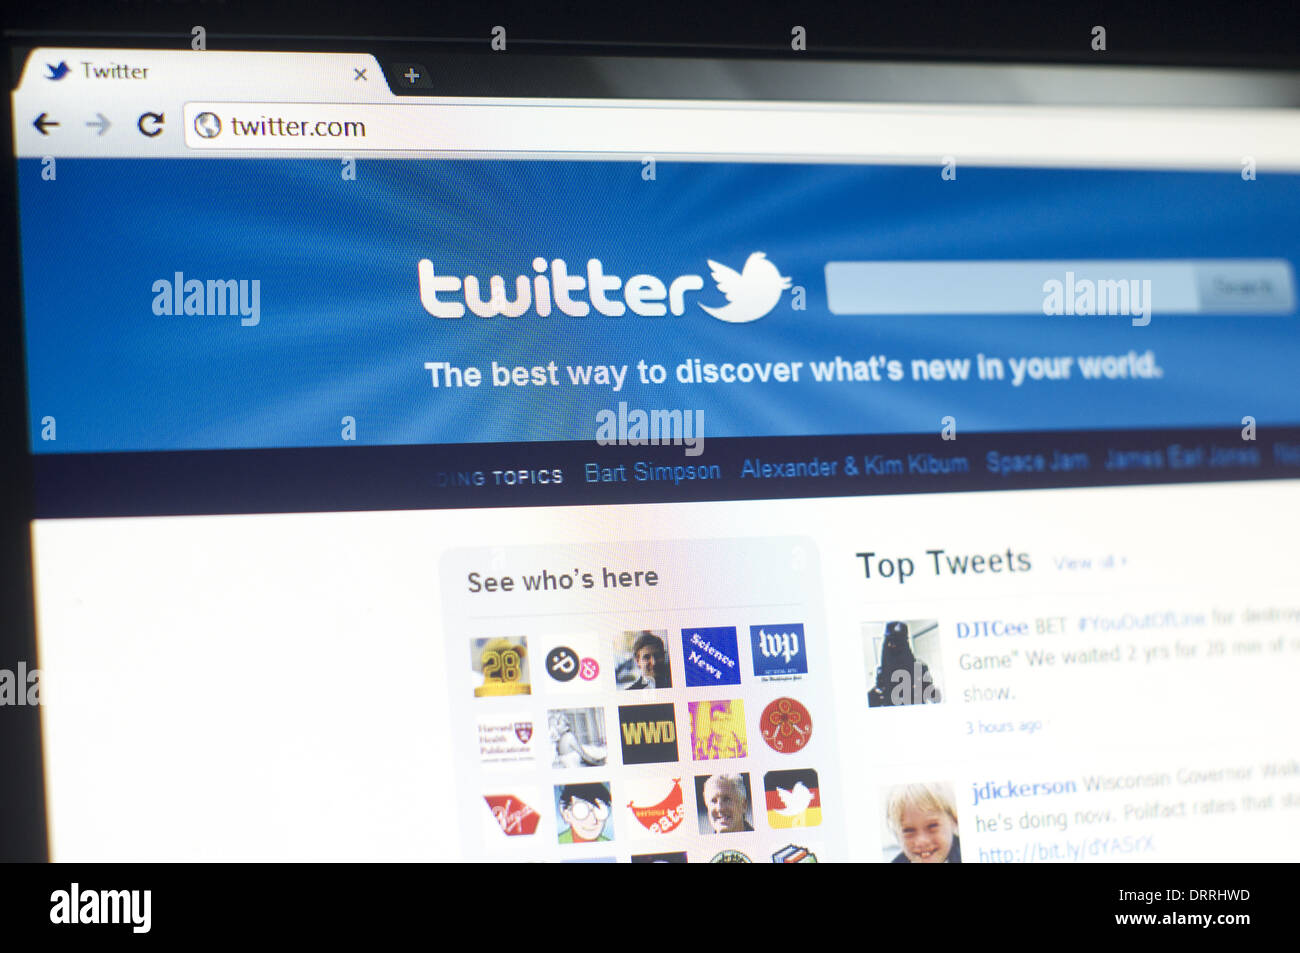 twitter login page Stock Photo   Alamy